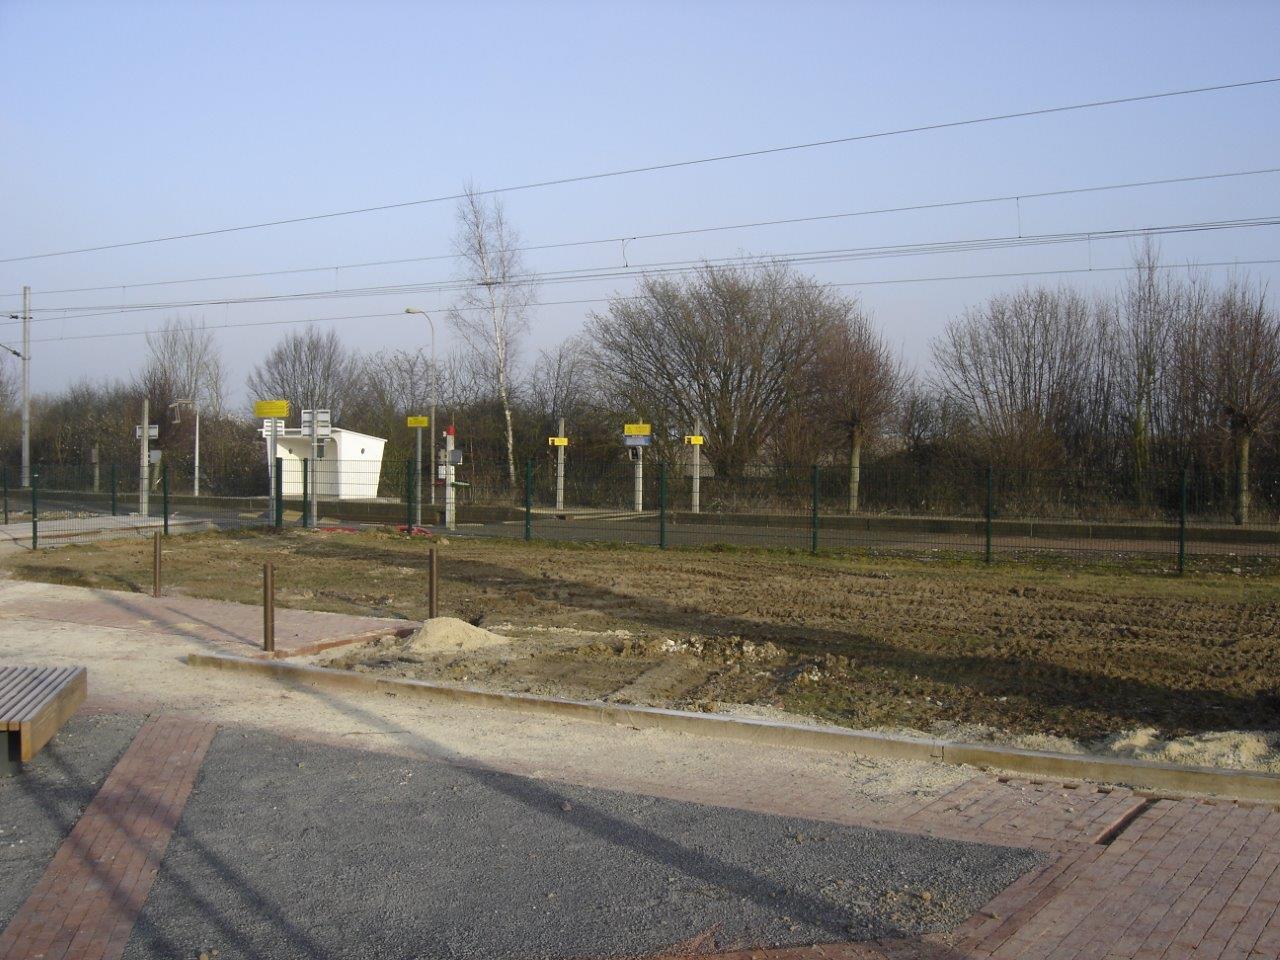 gare-de-bertry-train-station